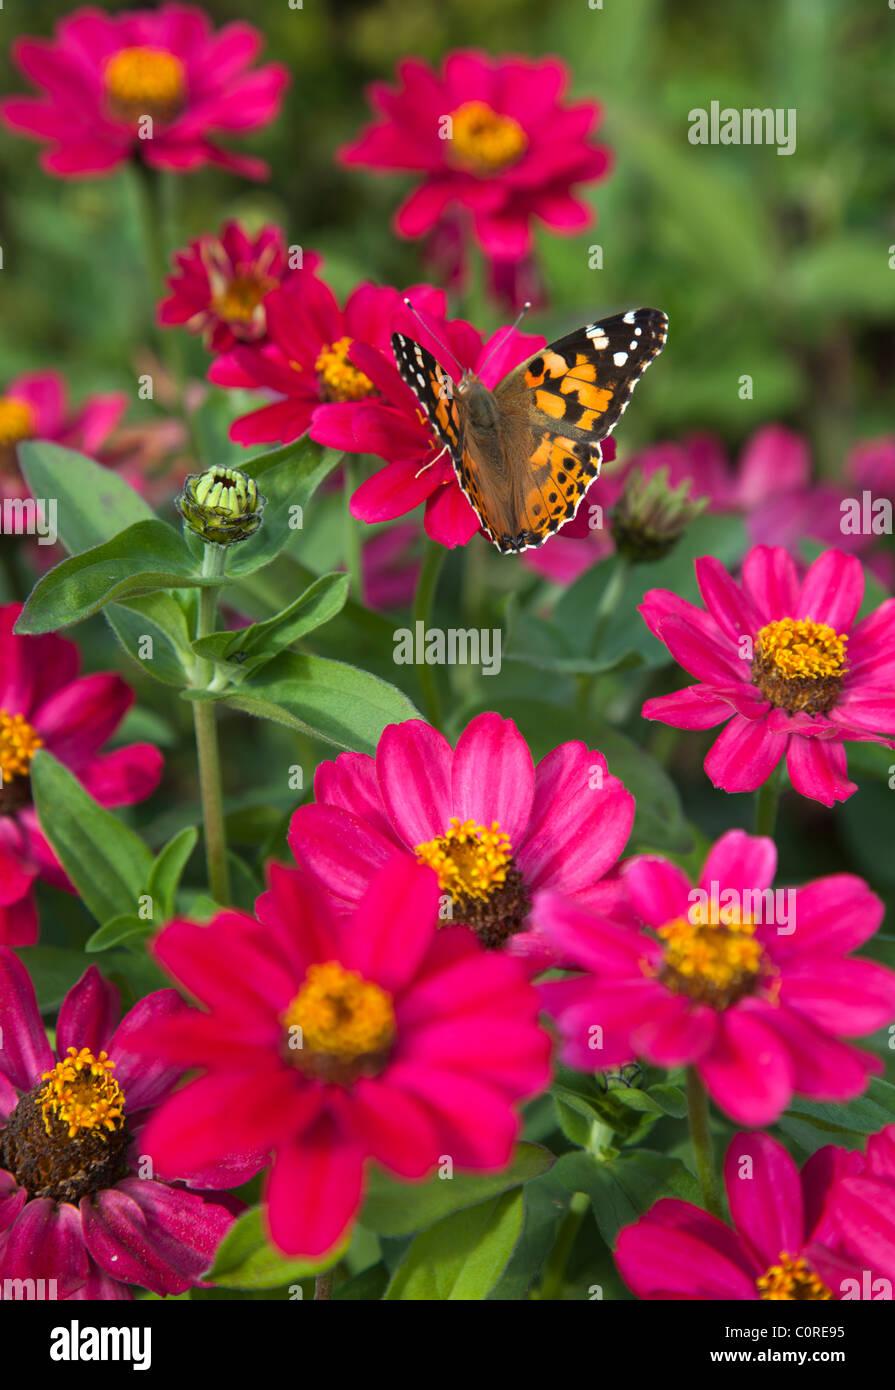 Dama pintada ( Vanessa cardui , Nymphalidae ) mariposa chupar néctar de flores rojas , Finlandia Foto de stock